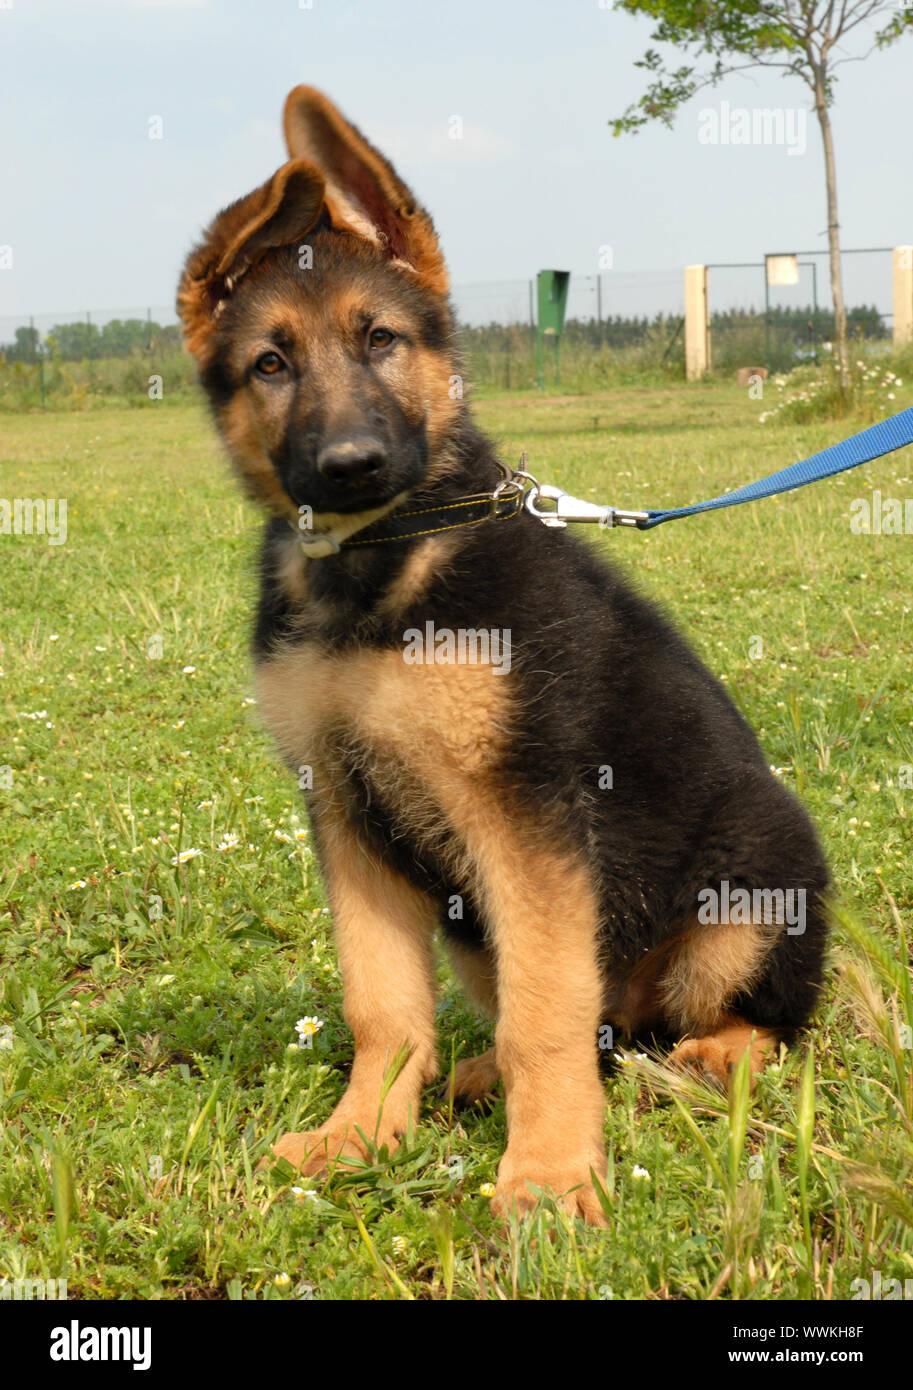 Portrait Of A Cute Puppy Purebred German Shepherd Stock Photo Alamy